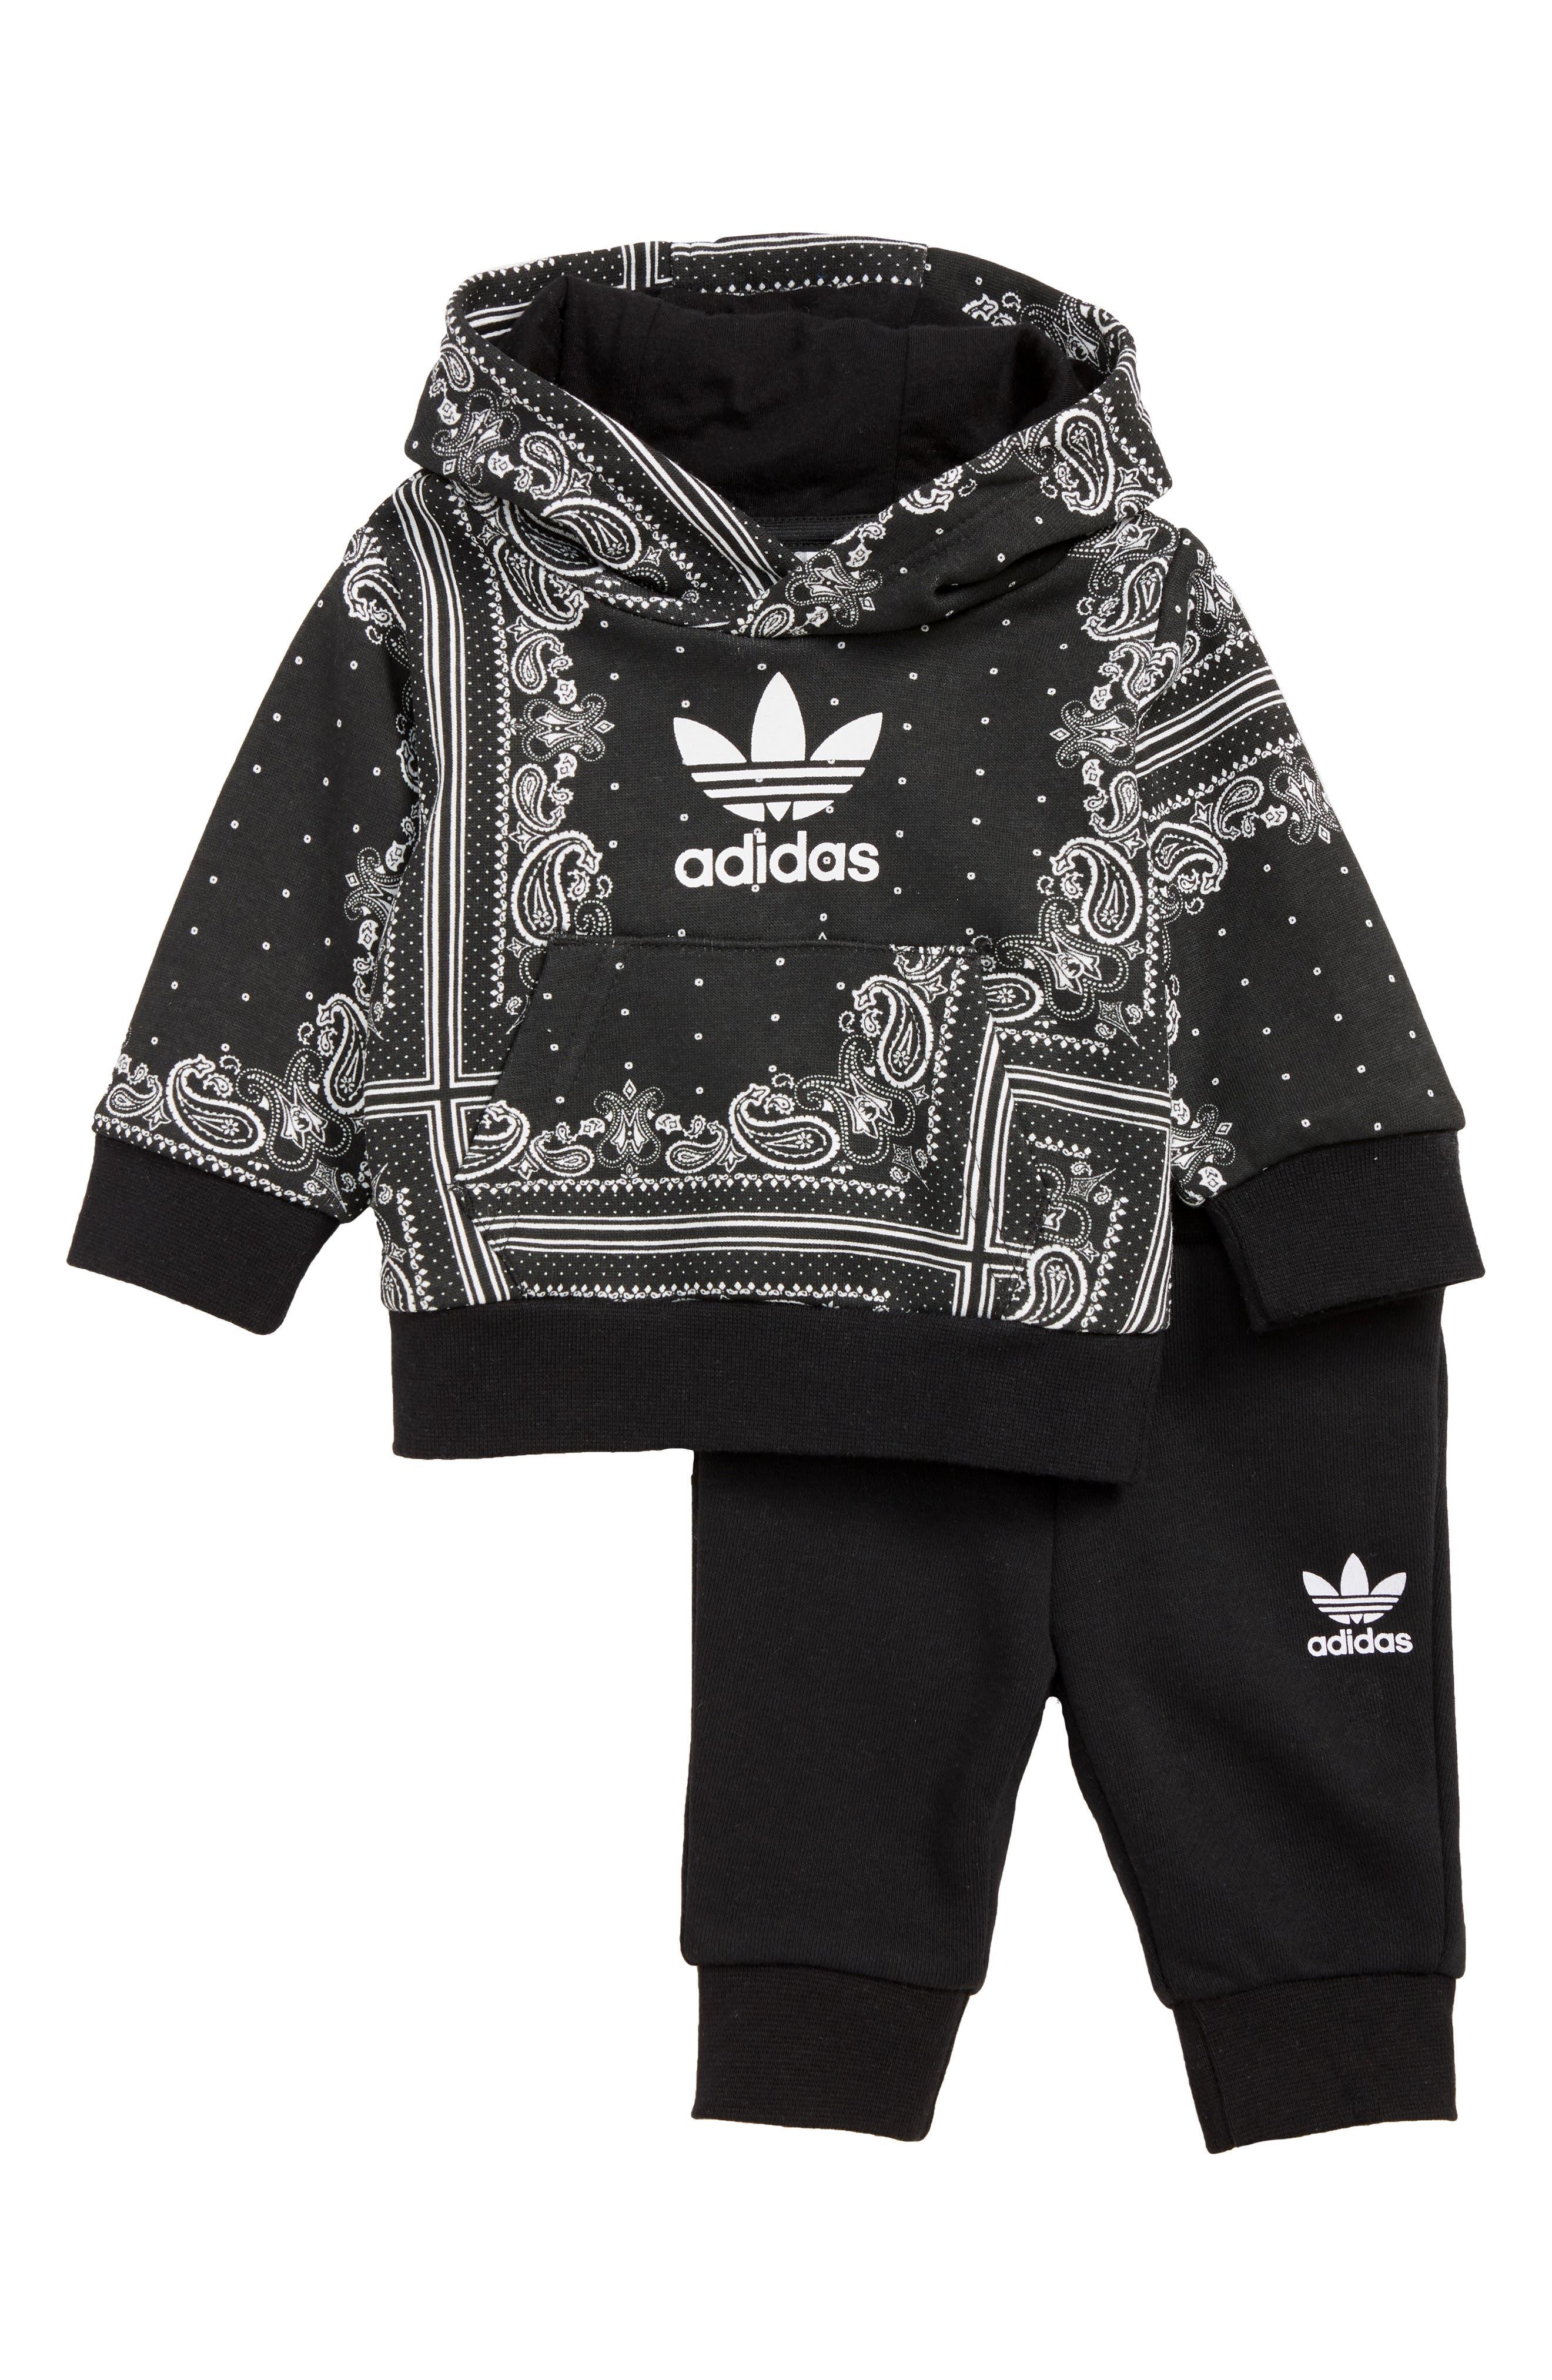 Infant Boys Adidas Bandana Hoodie  Sweatpants Set